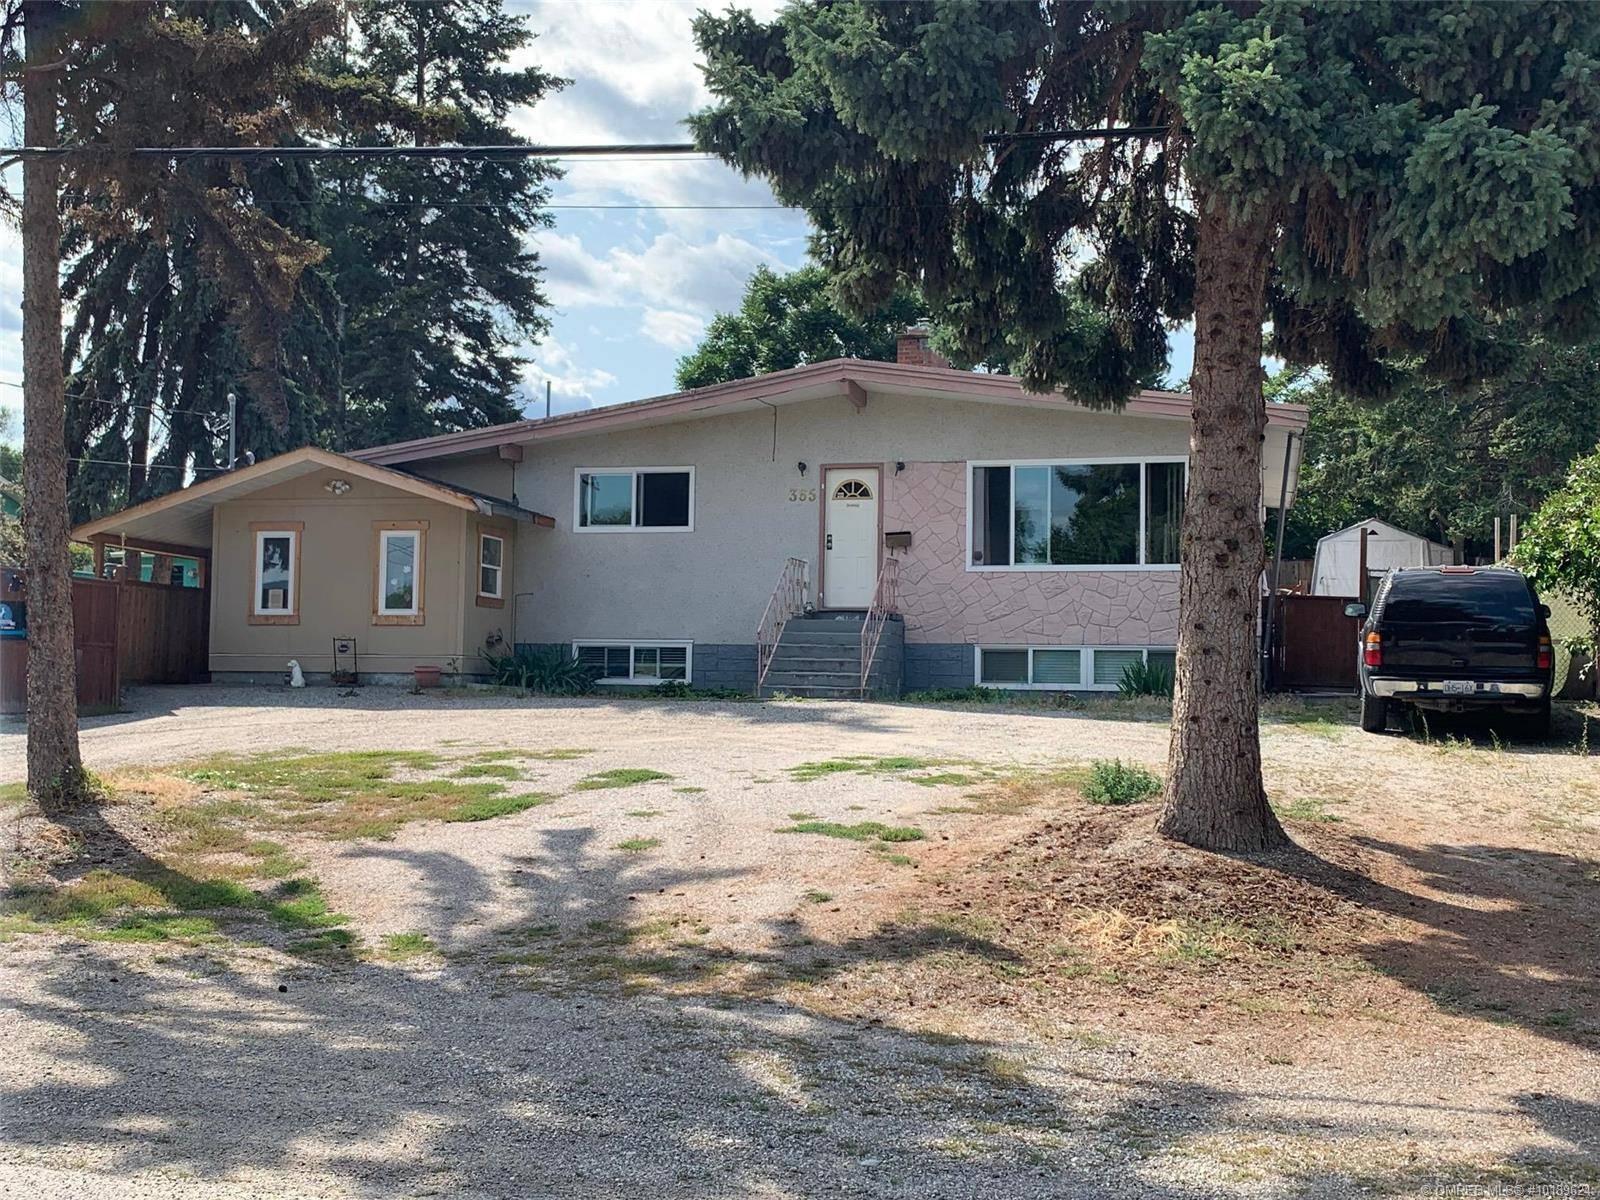 House for sale at 365 Clarissa Rd Kelowna British Columbia - MLS: 10189624